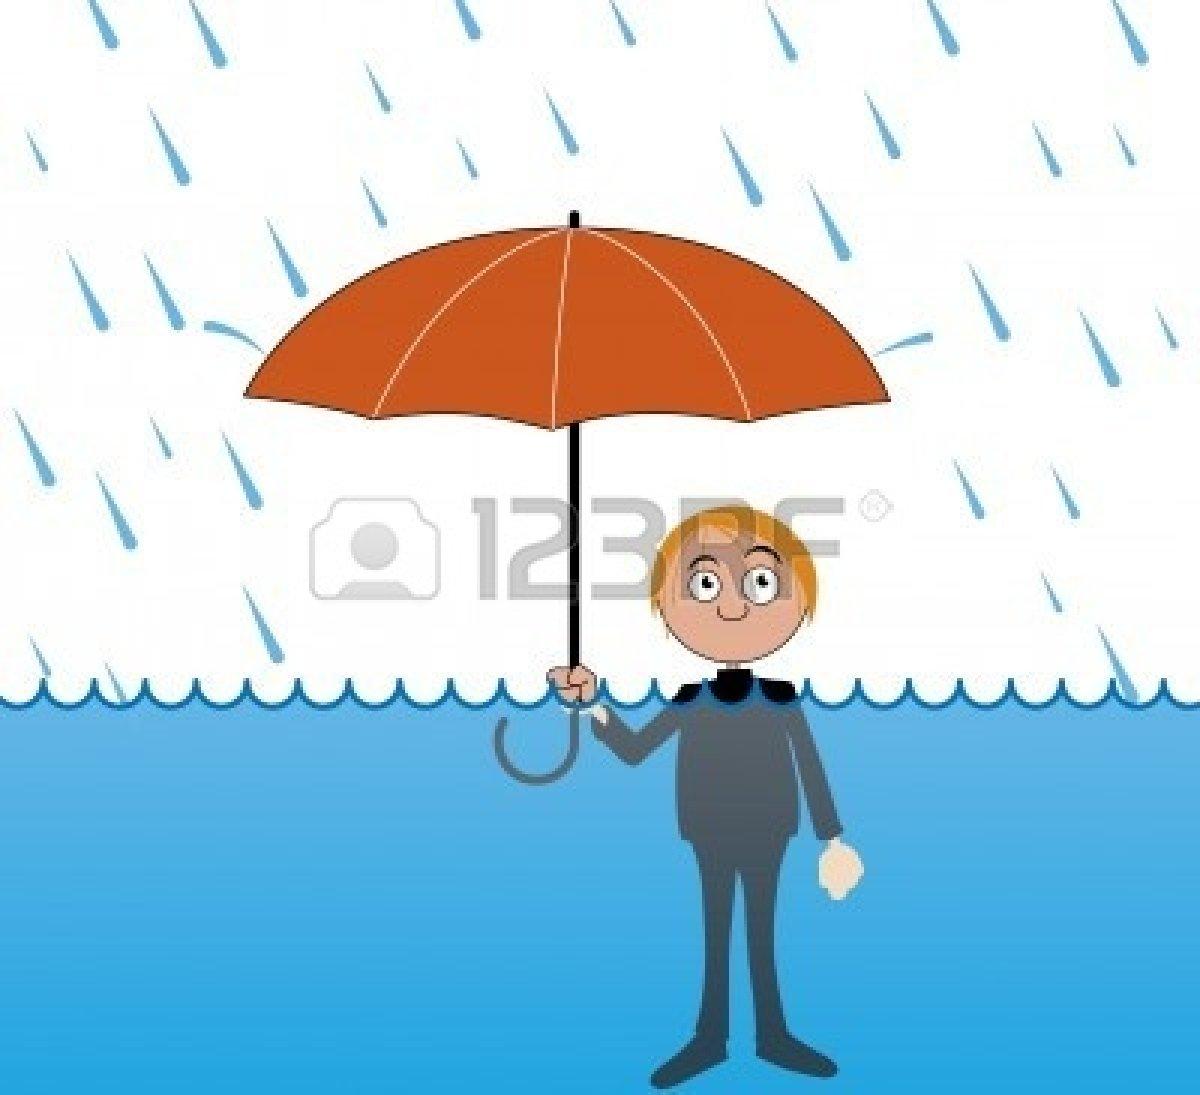 Hosue clipart raining Flooding Clipart Free Images flooding%20clipart